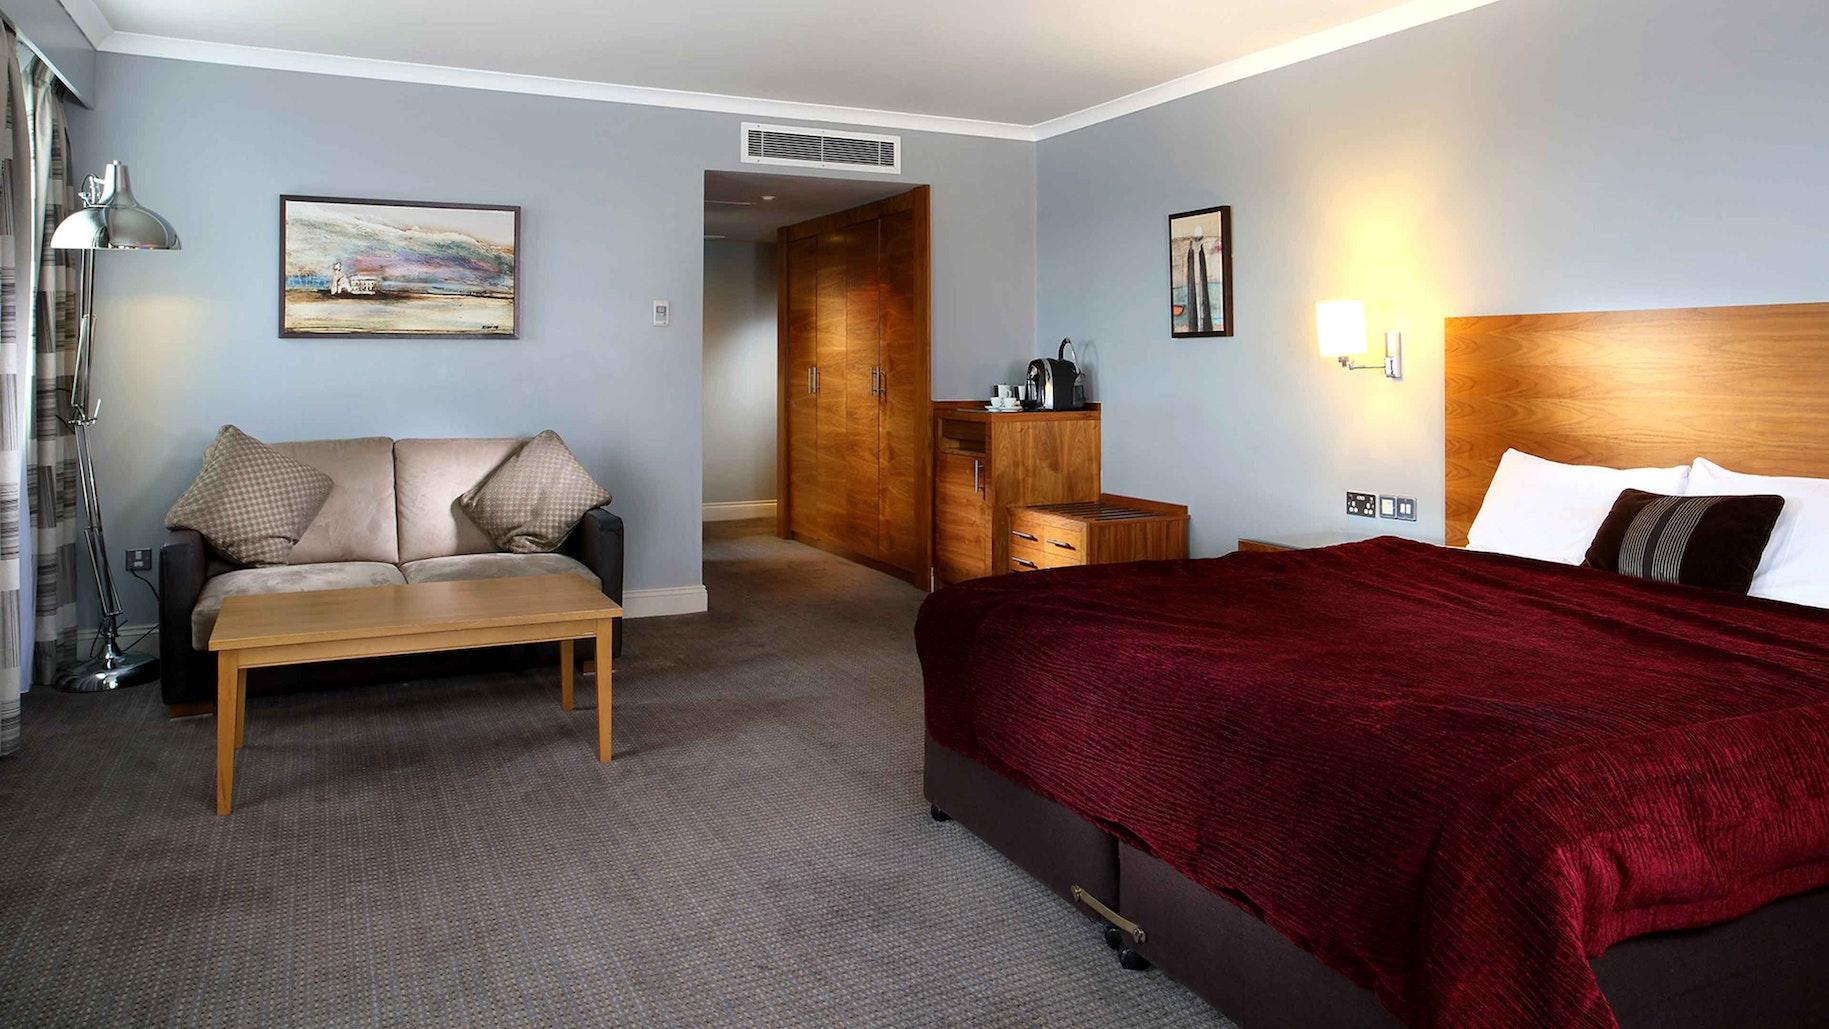 Best Western Croydon Hotel near Chessington World of Adventures Resort